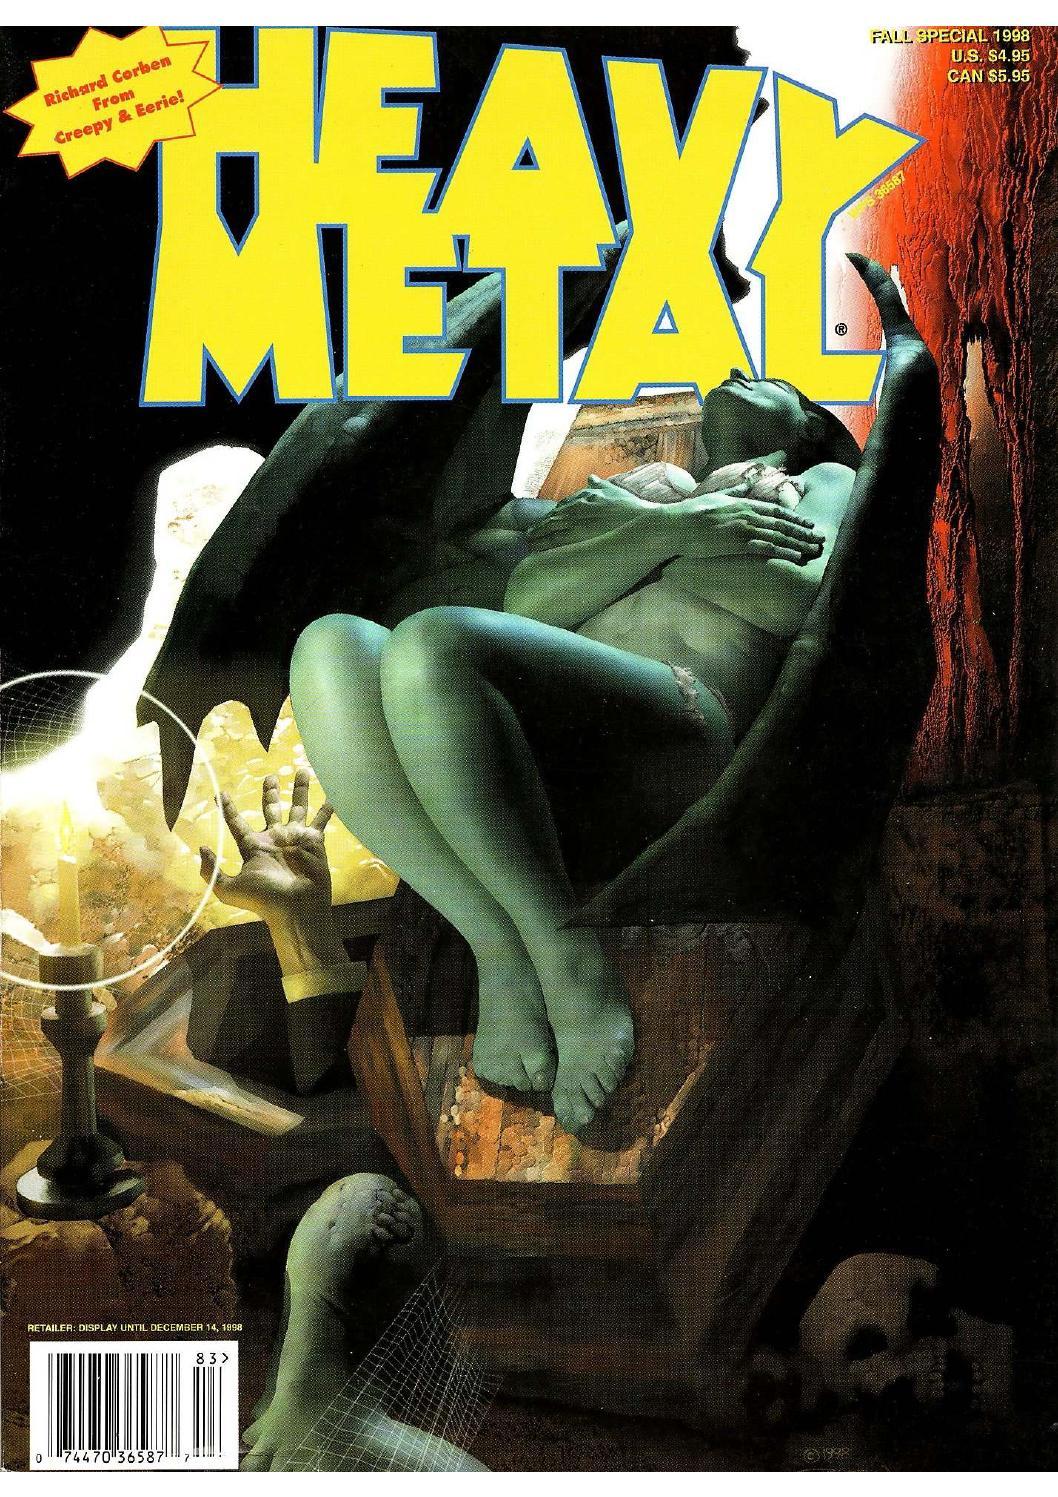 Heavy Metal 199802 Best Of Richard Corben Special By